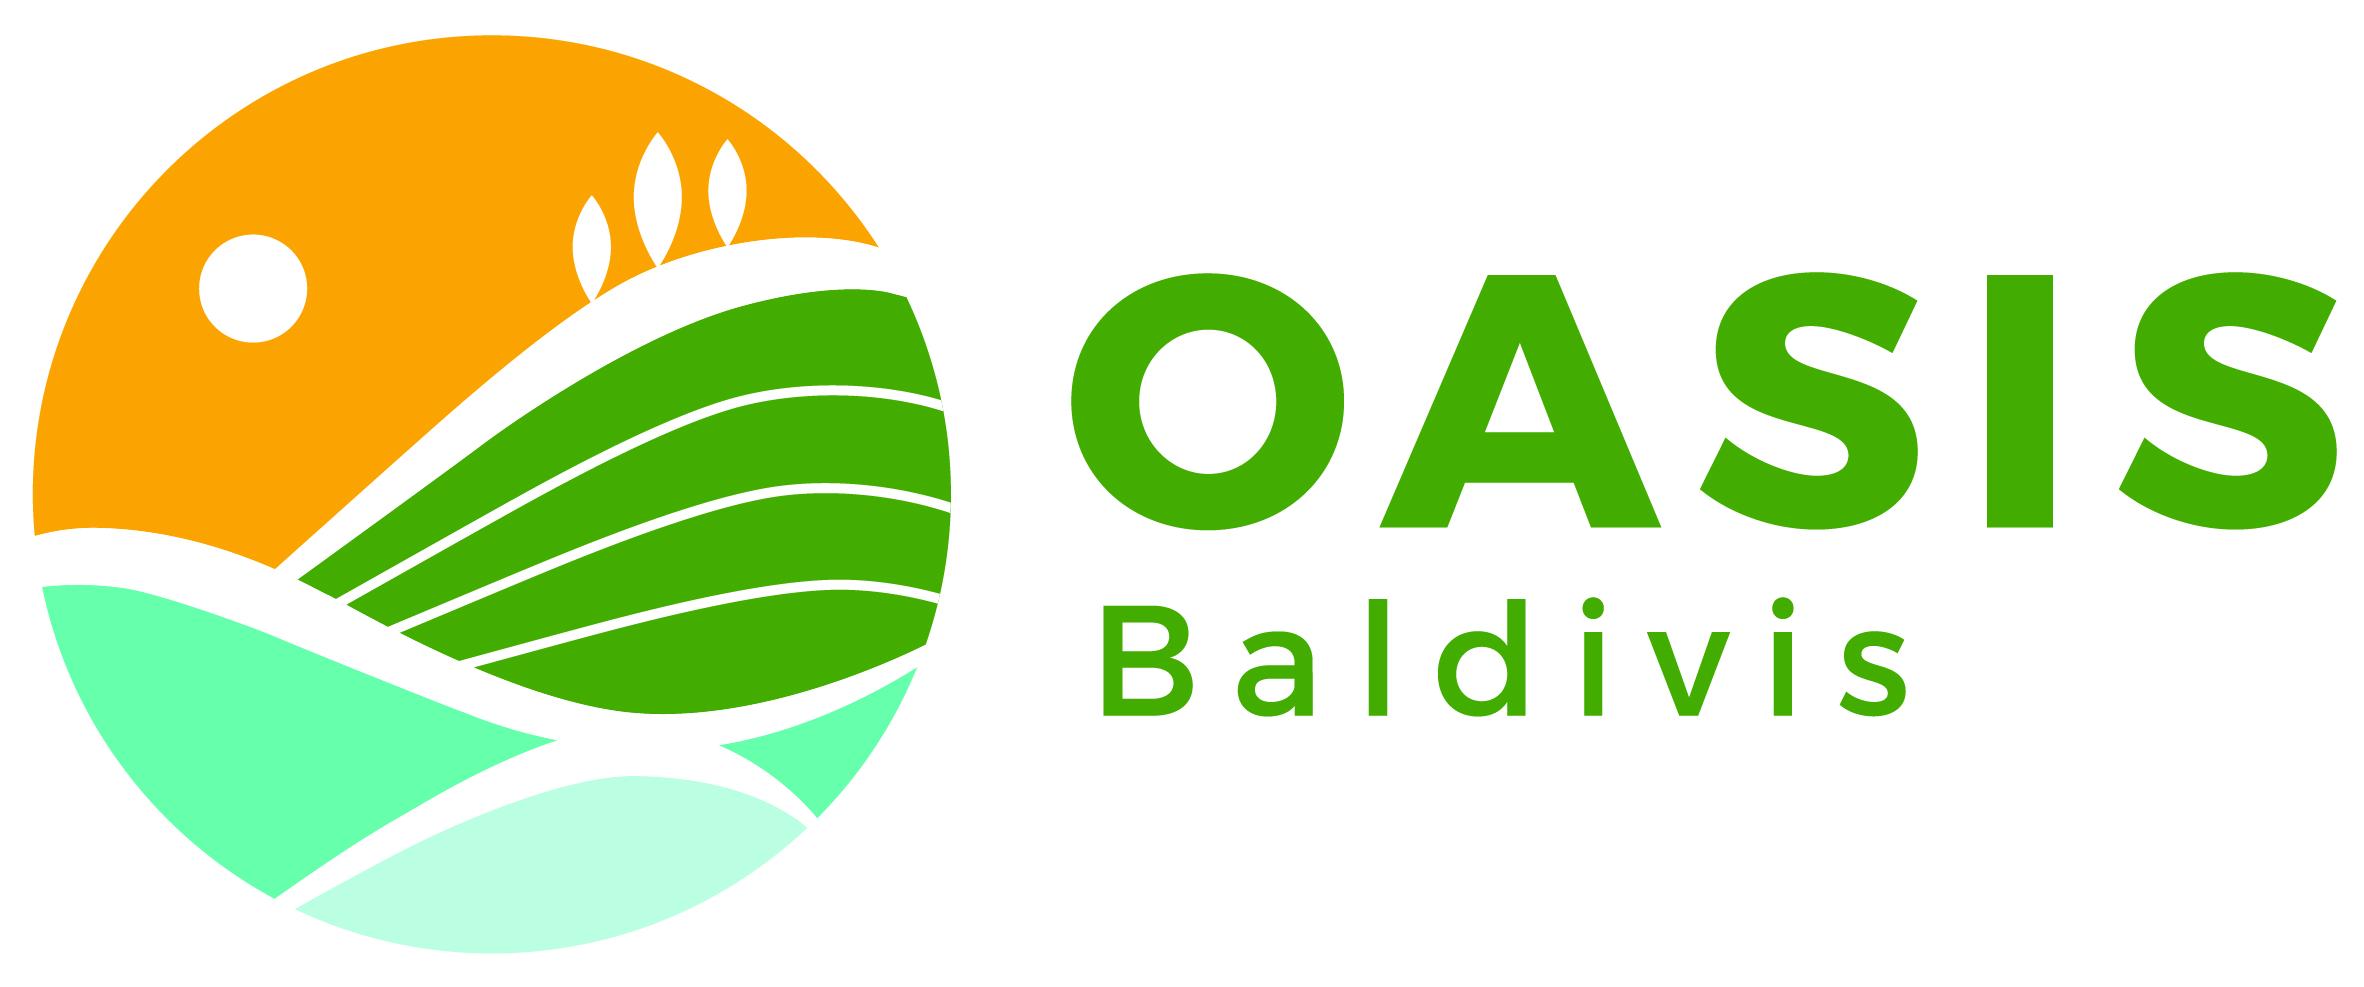 Lot 809 Wellspring Road Baldivis - Land For Sale - 21572490 - Acton Fremantle